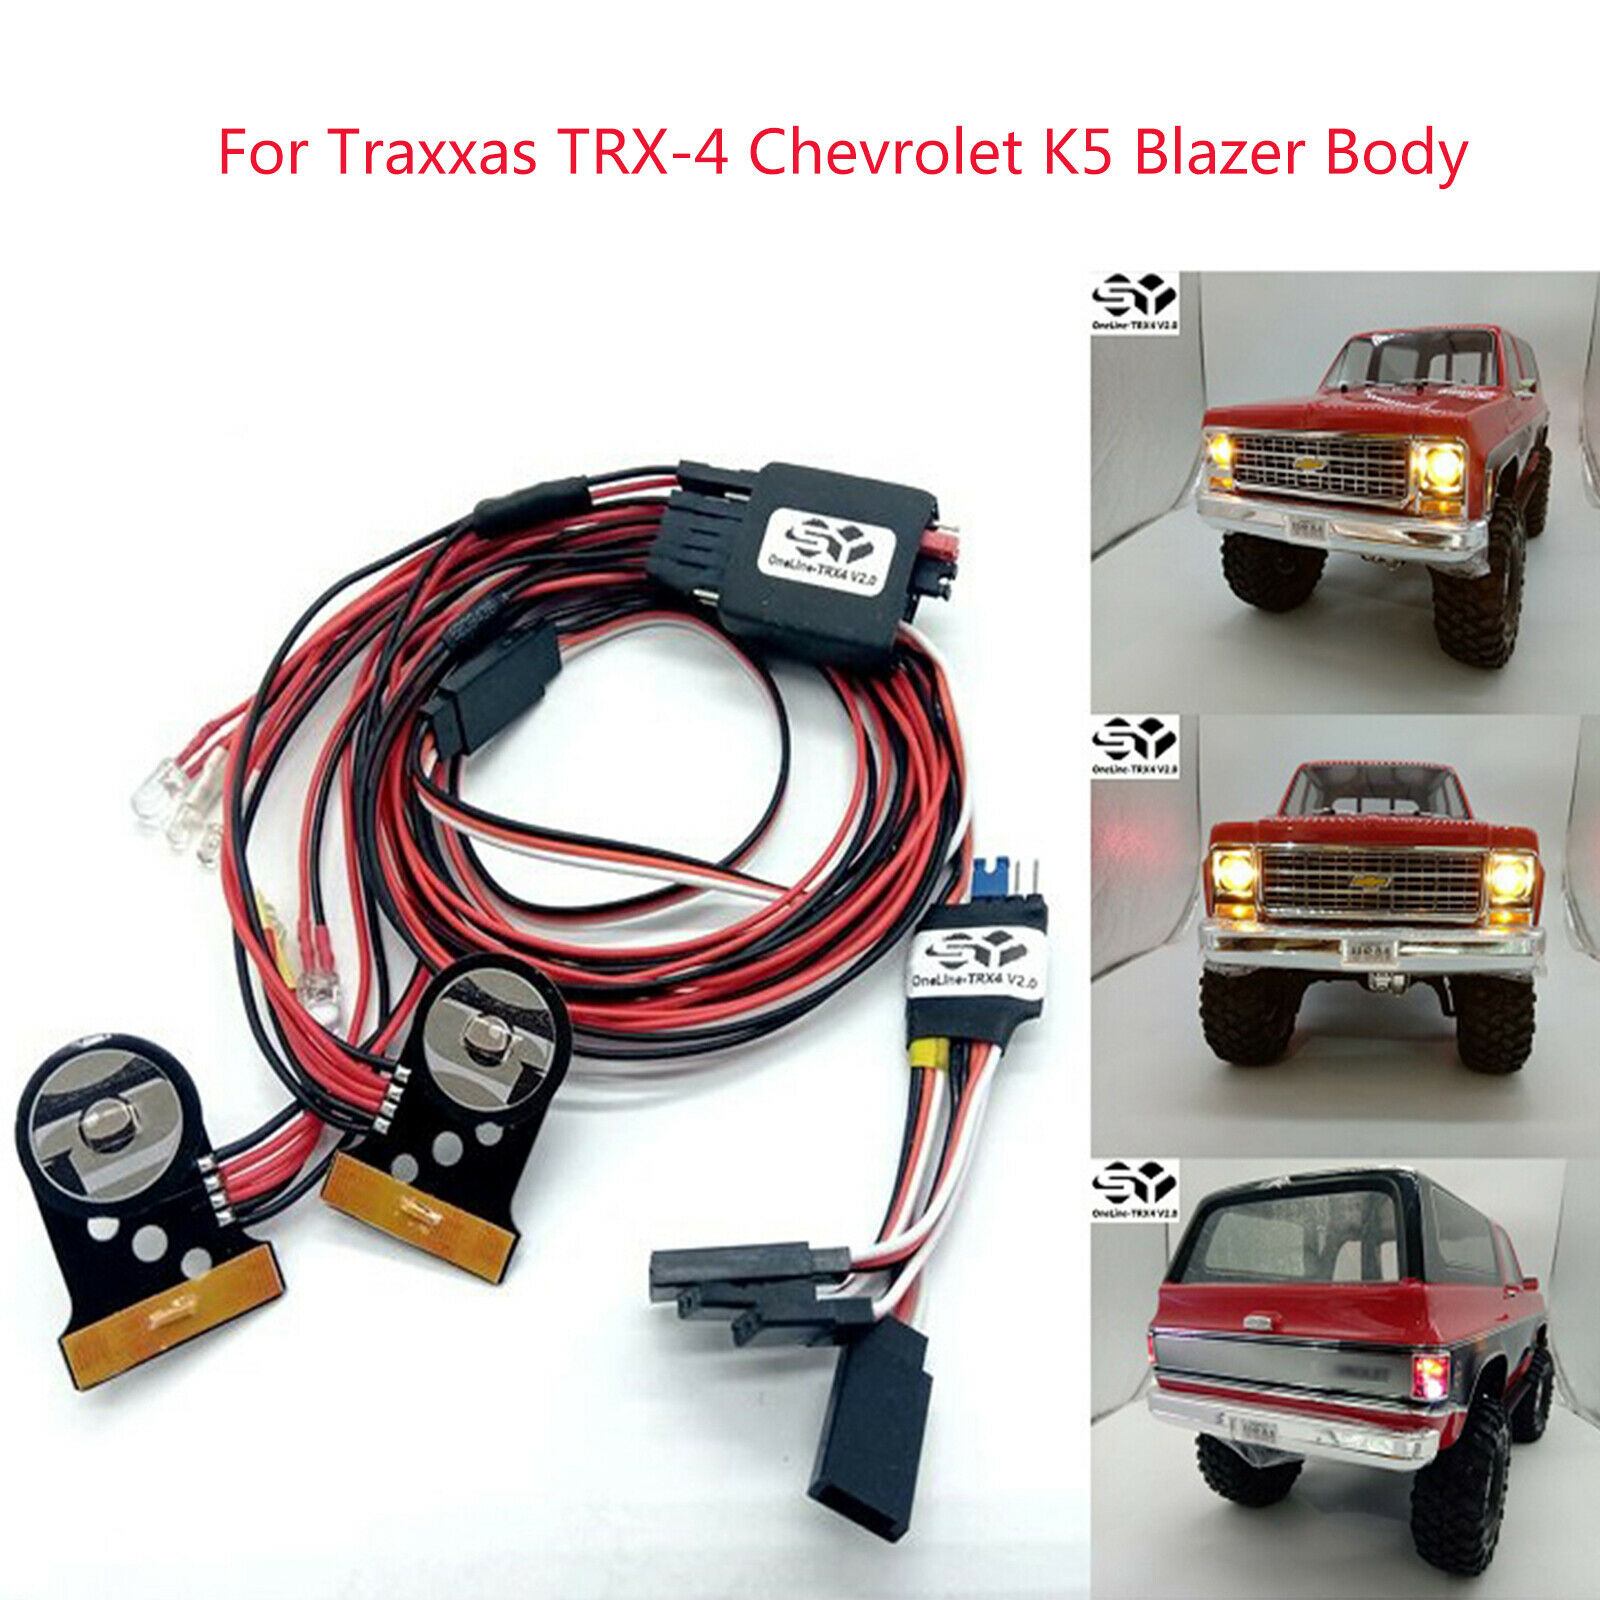 Online-trx4 v2.0 luz LED lámpara lámpara set para Traxxas trx-4 Chevrolet k5 blazer Body